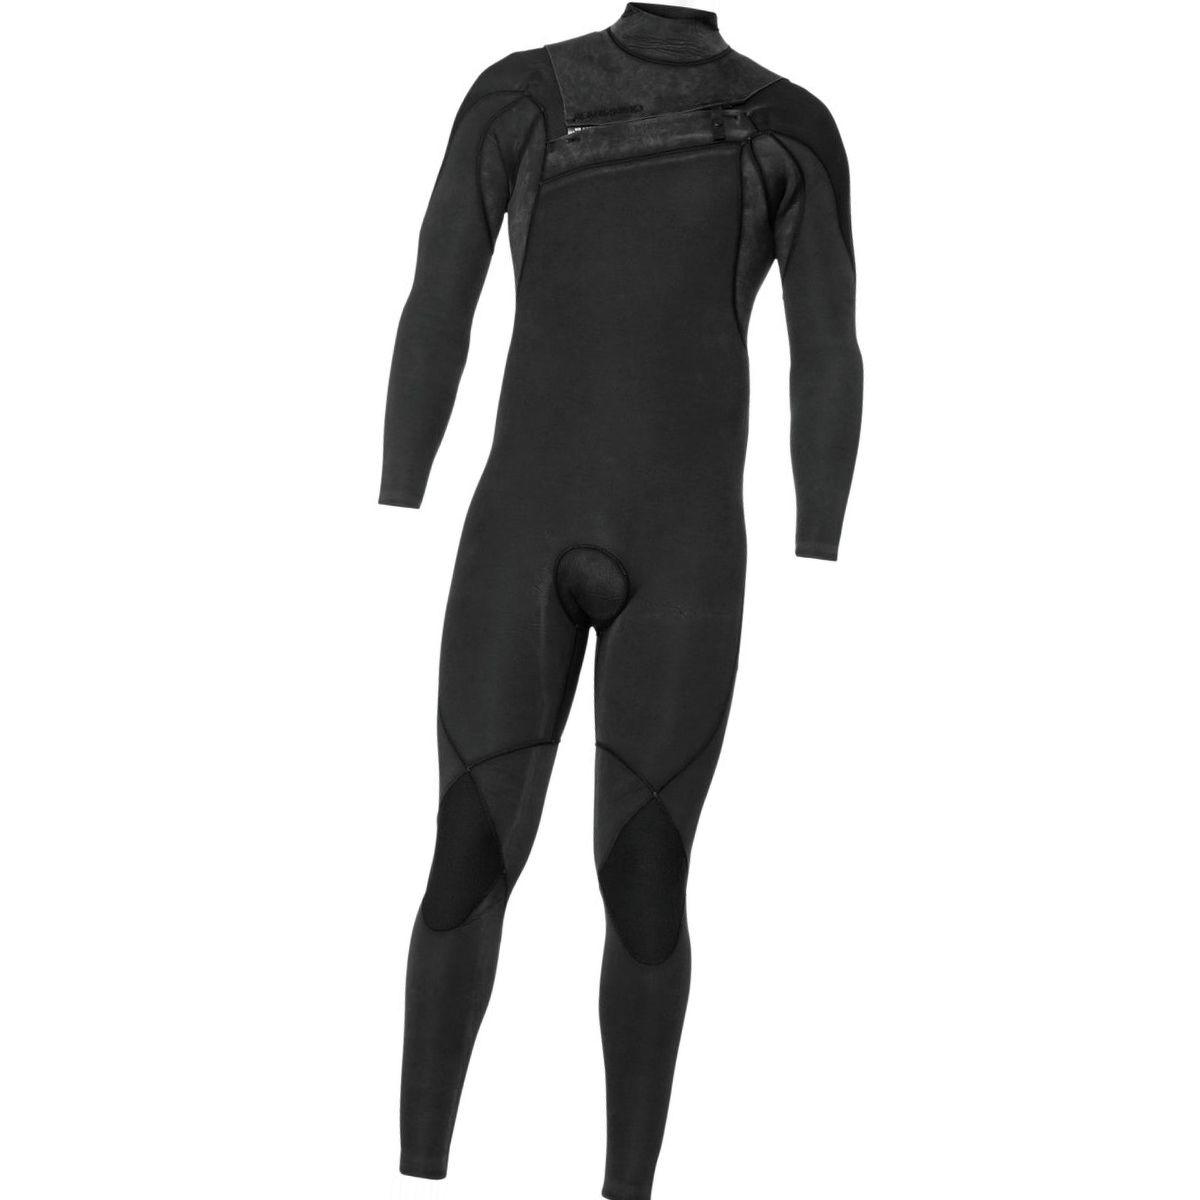 Quiksilver 4/3 Monochrome GBS A-Zip Steamer Wetsuit - Men's